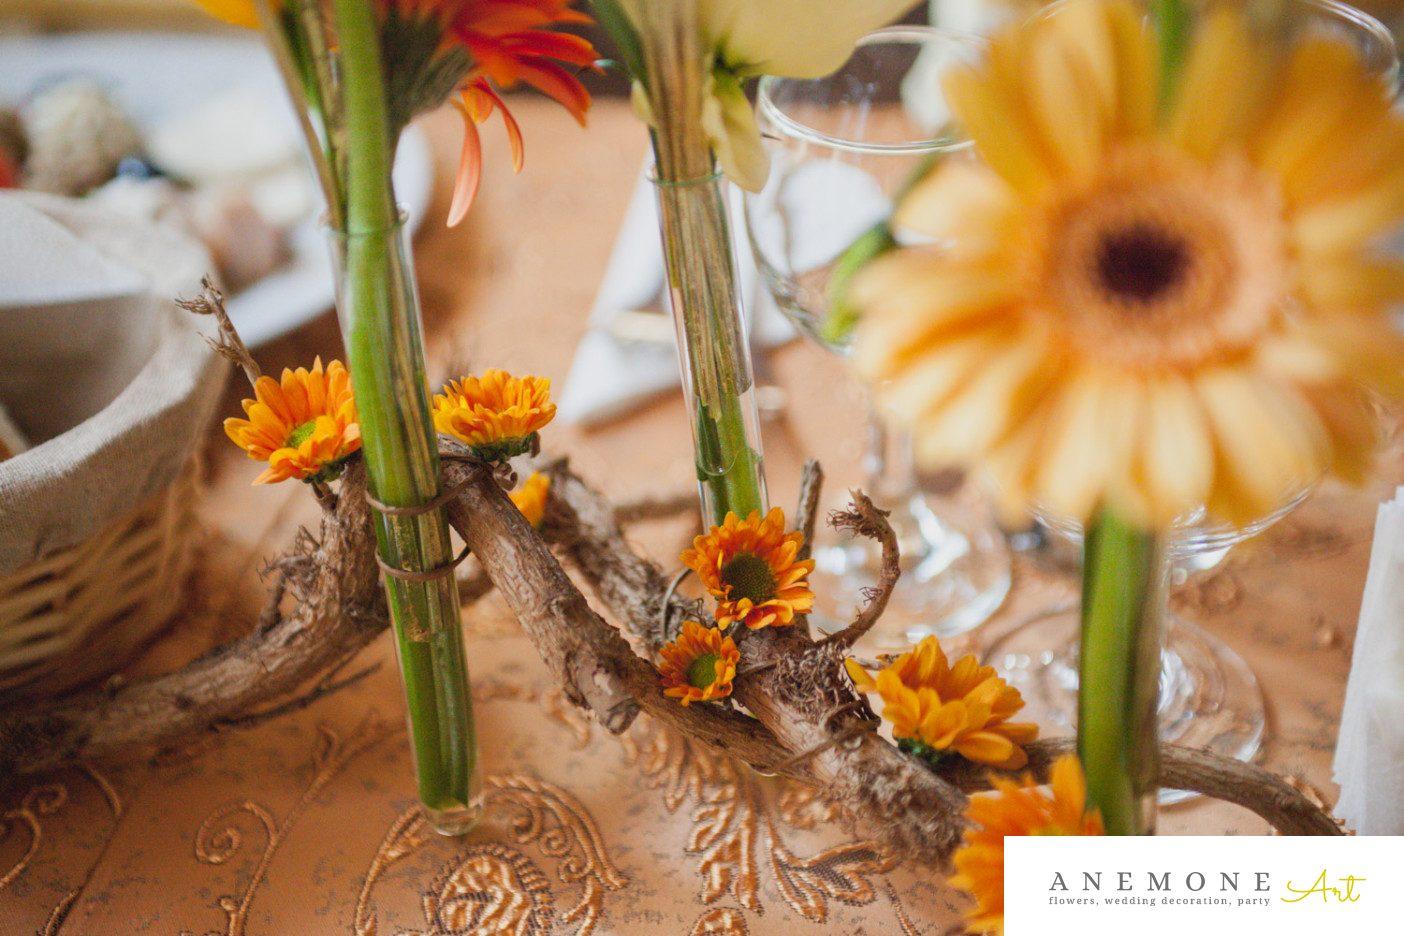 Poza, foto cu Flori de nunta crengi, decor masa, detaliu, frezii, mini-gerbera, portocaliu, toamna in Arad, Timisoara, Oradea (wedding flowers, bouquets) nunta Arad, Timisoara, Oradea